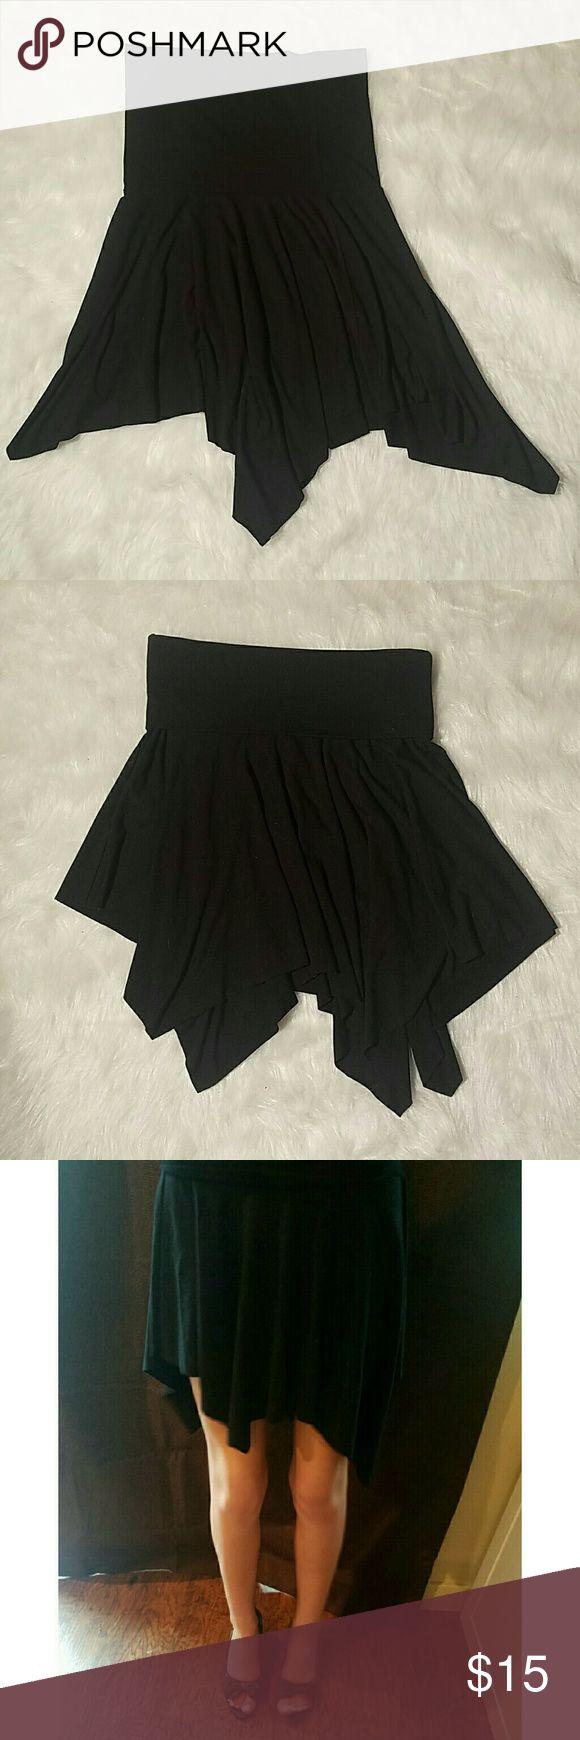 Stretchy asymmetrical black skirt Soft and stretchy, black asymmetrical skirt, EUC no fading or signs of wear Shameless  Skirts Asymmetrical